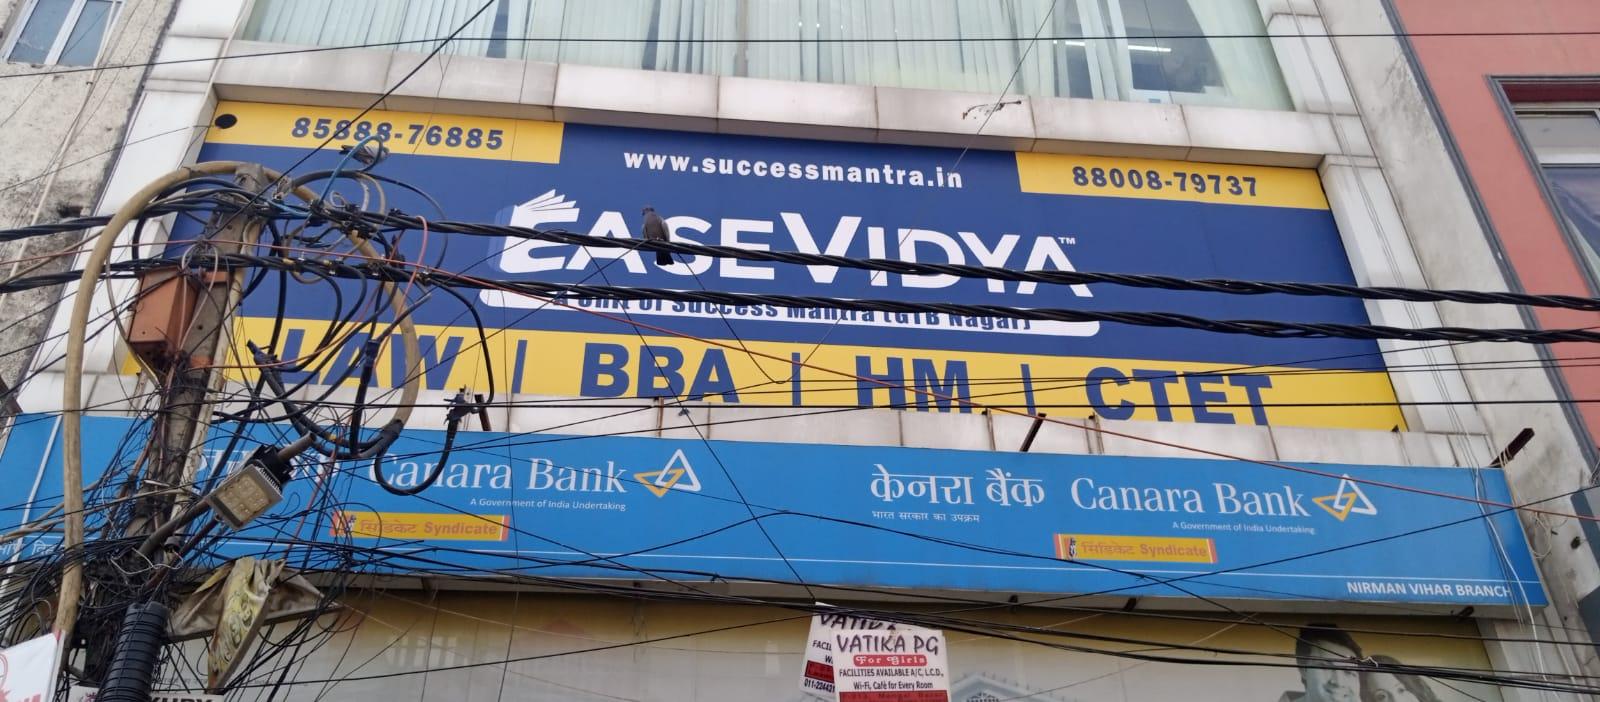 EaseVidya Logo